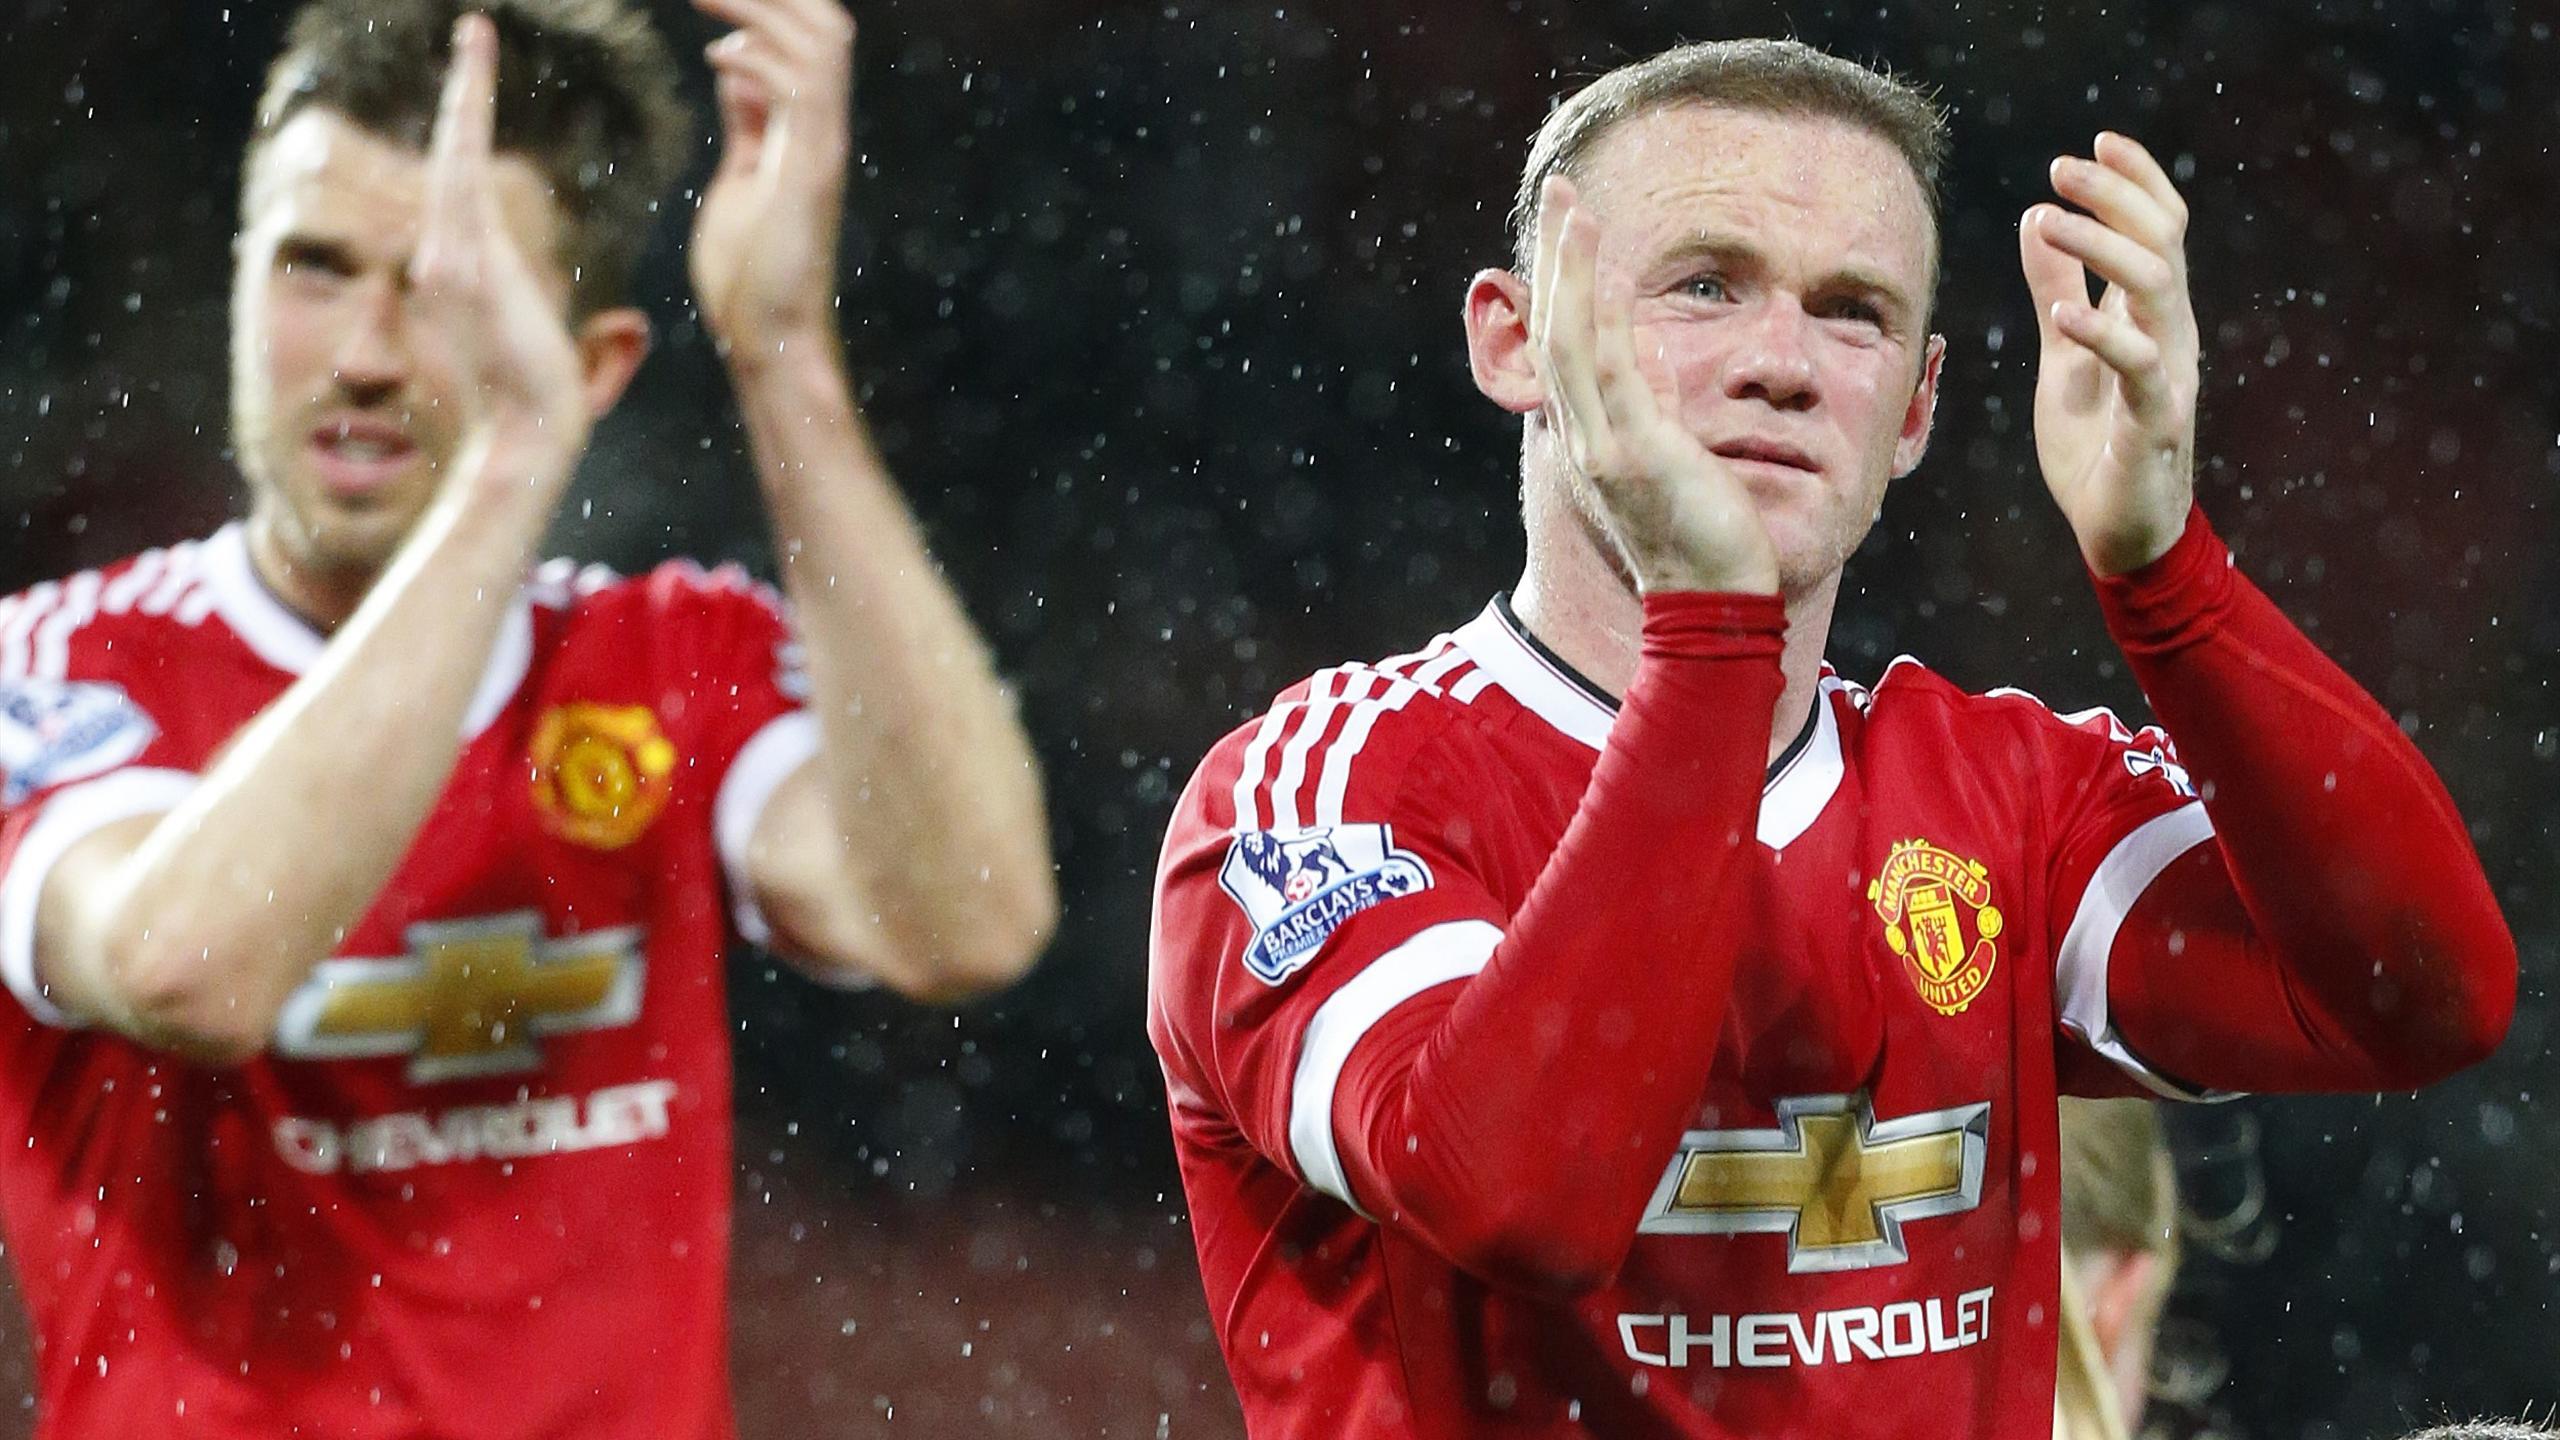 Manchester United's English midfielder Michael Carrick (L) and Manchester United's English striker Wayne Rooney